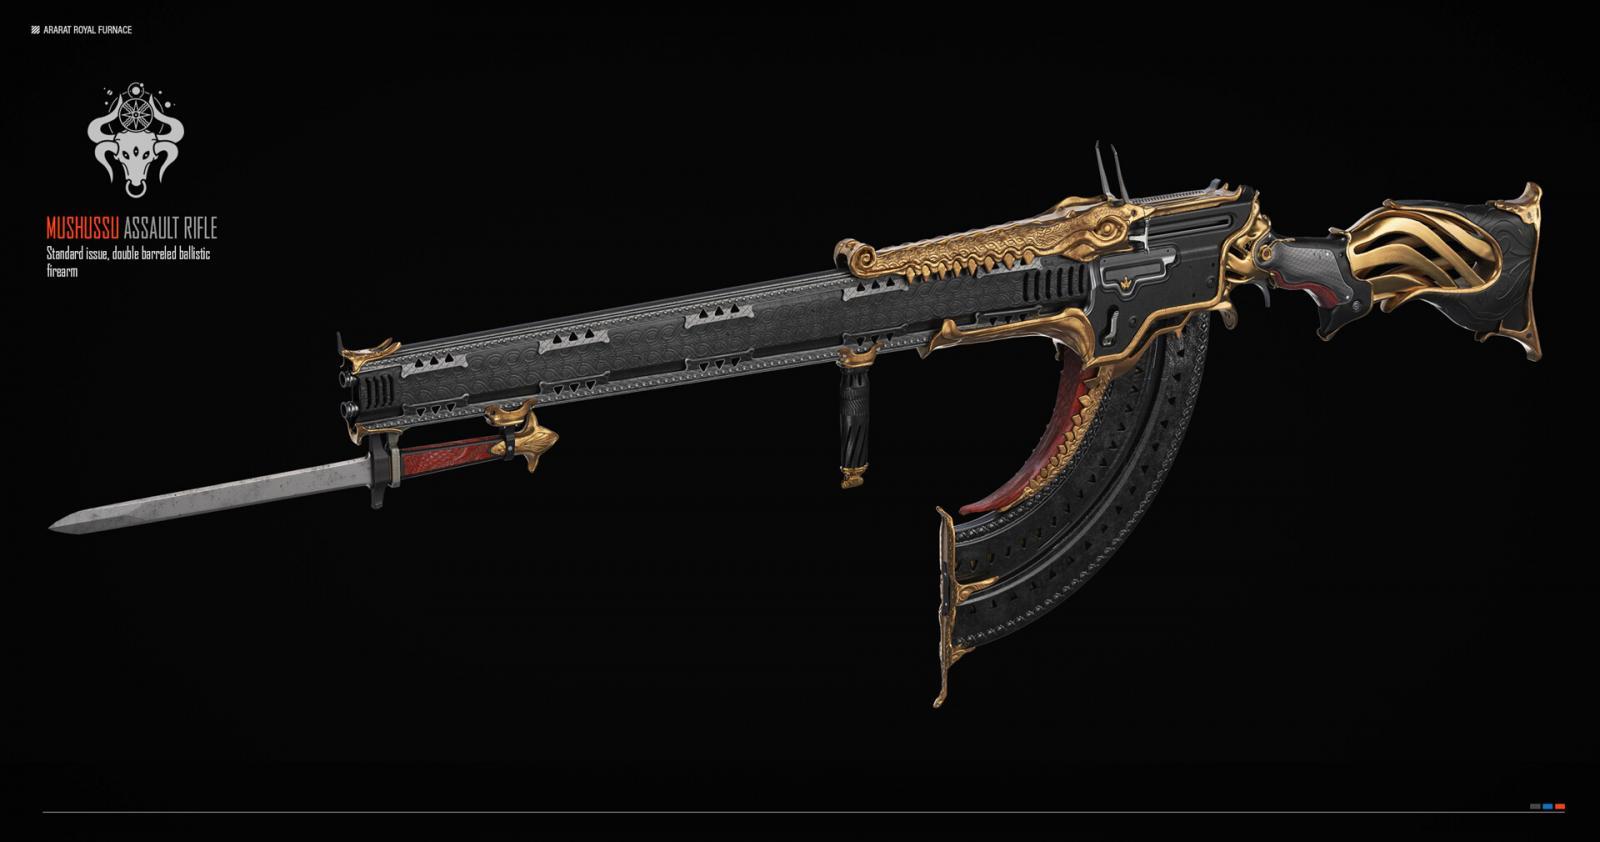 pavel-postovoit-layout-empire-rifle.jpg